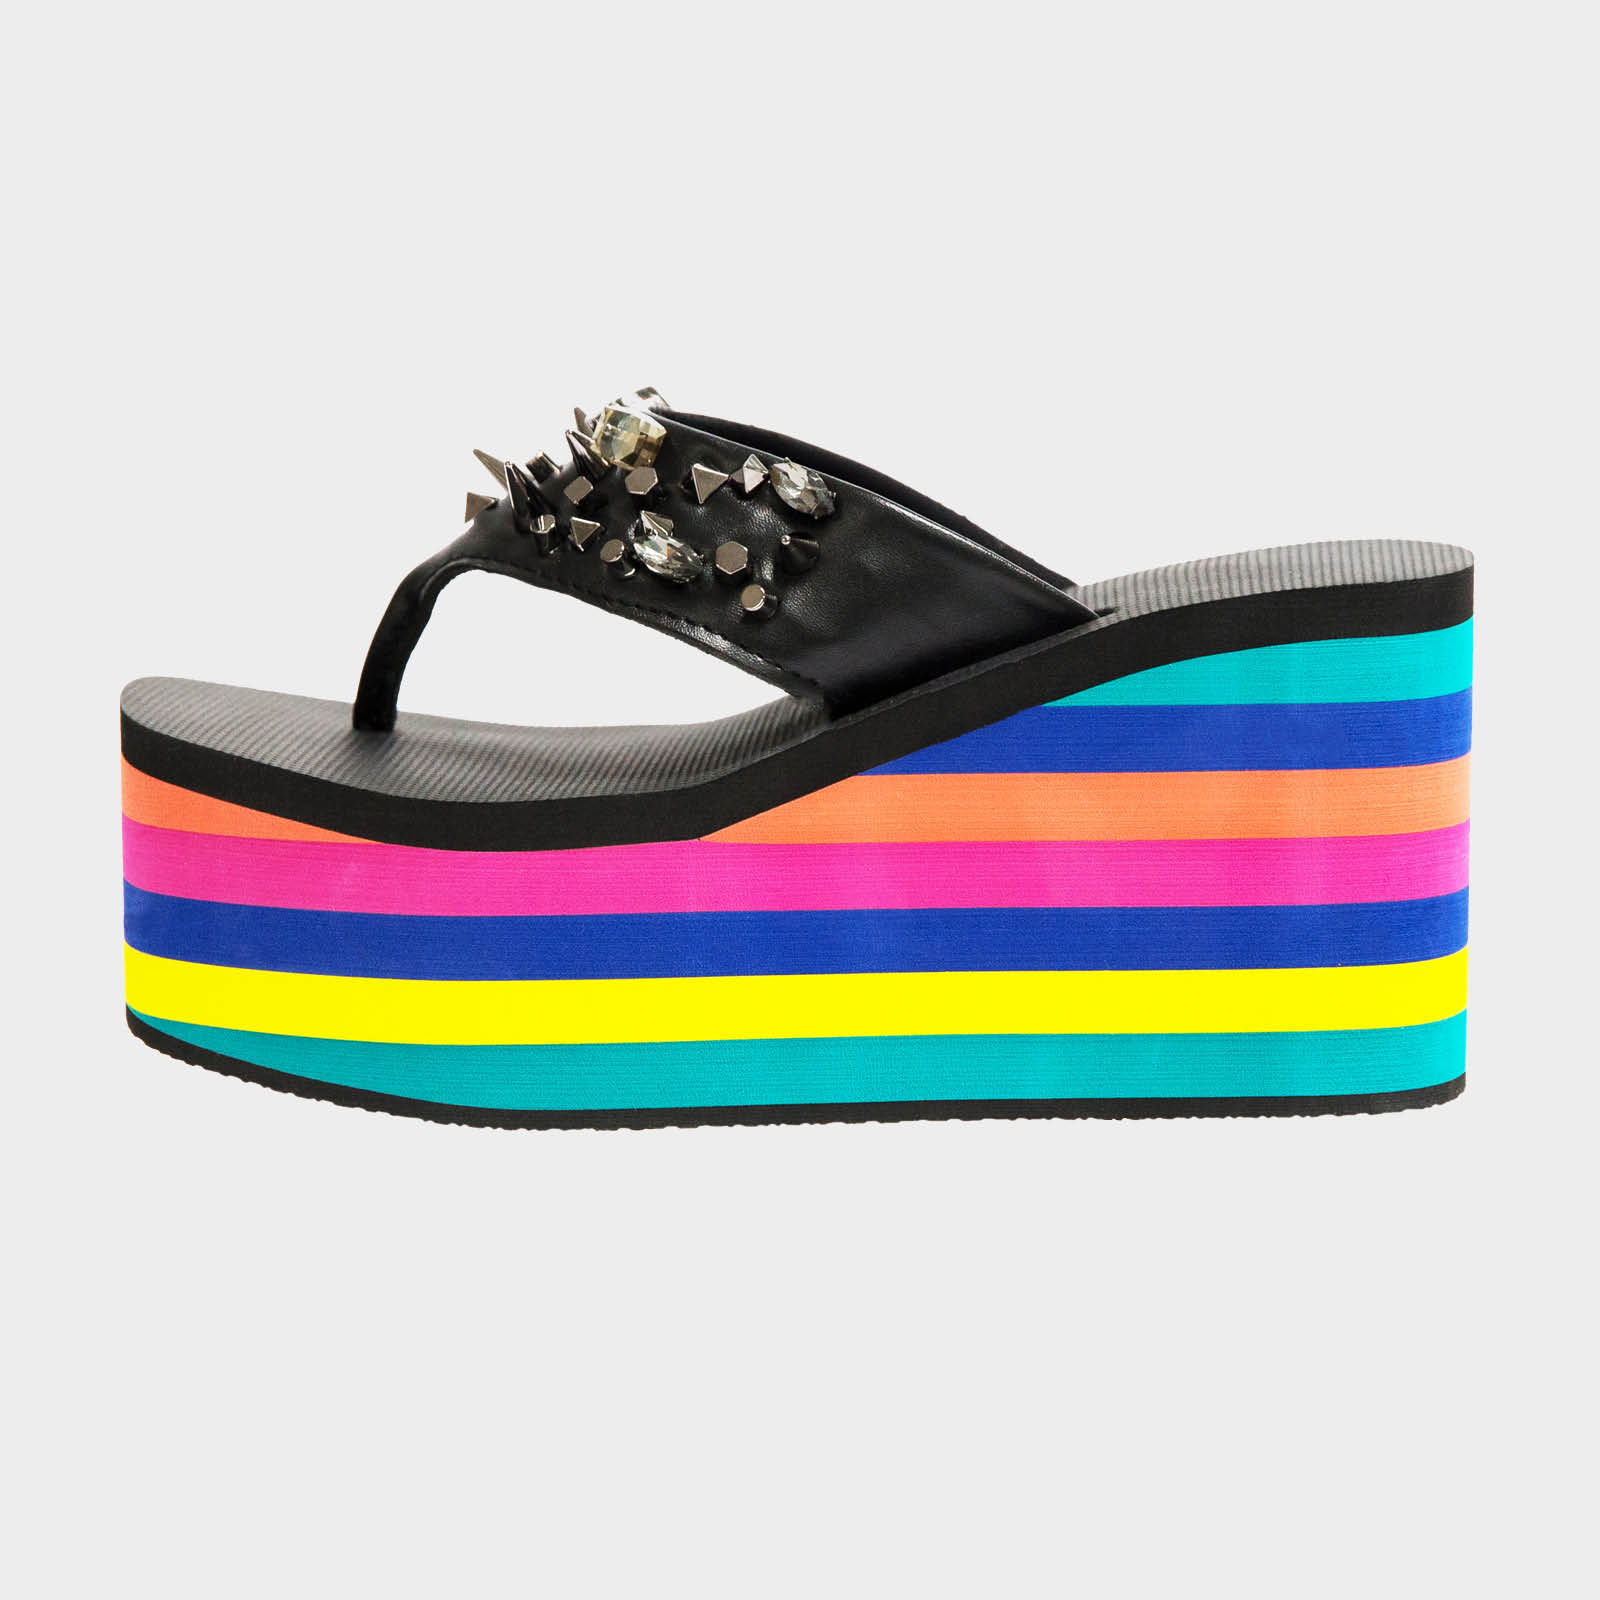 Sandal Deluxe